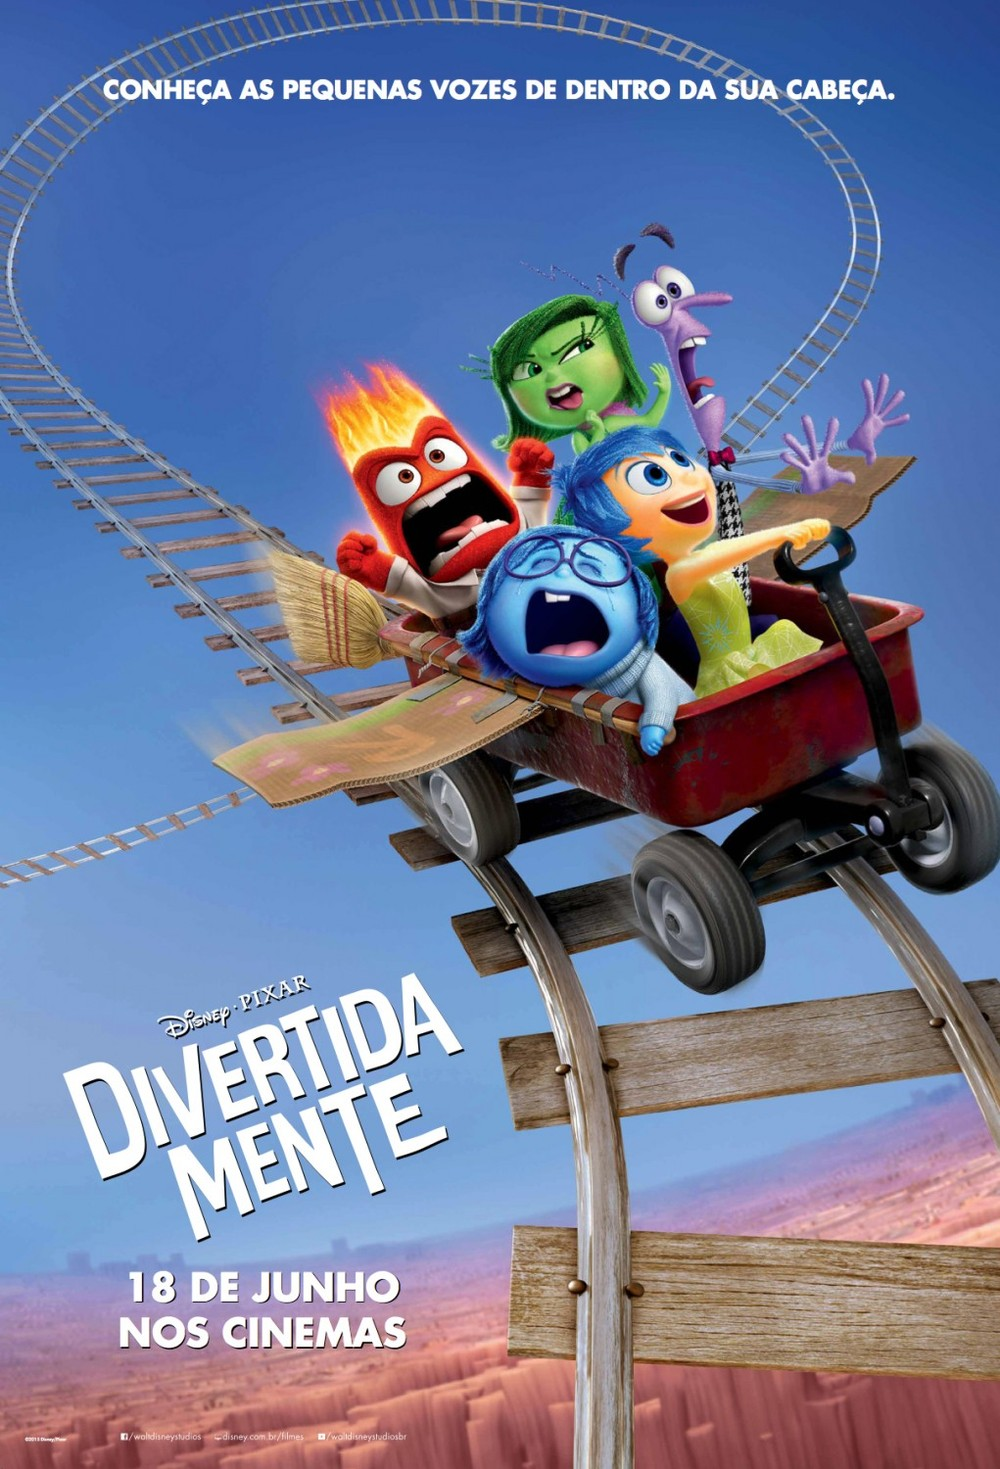 Story 2 Dvd Disney Story Toy Pixar Toy